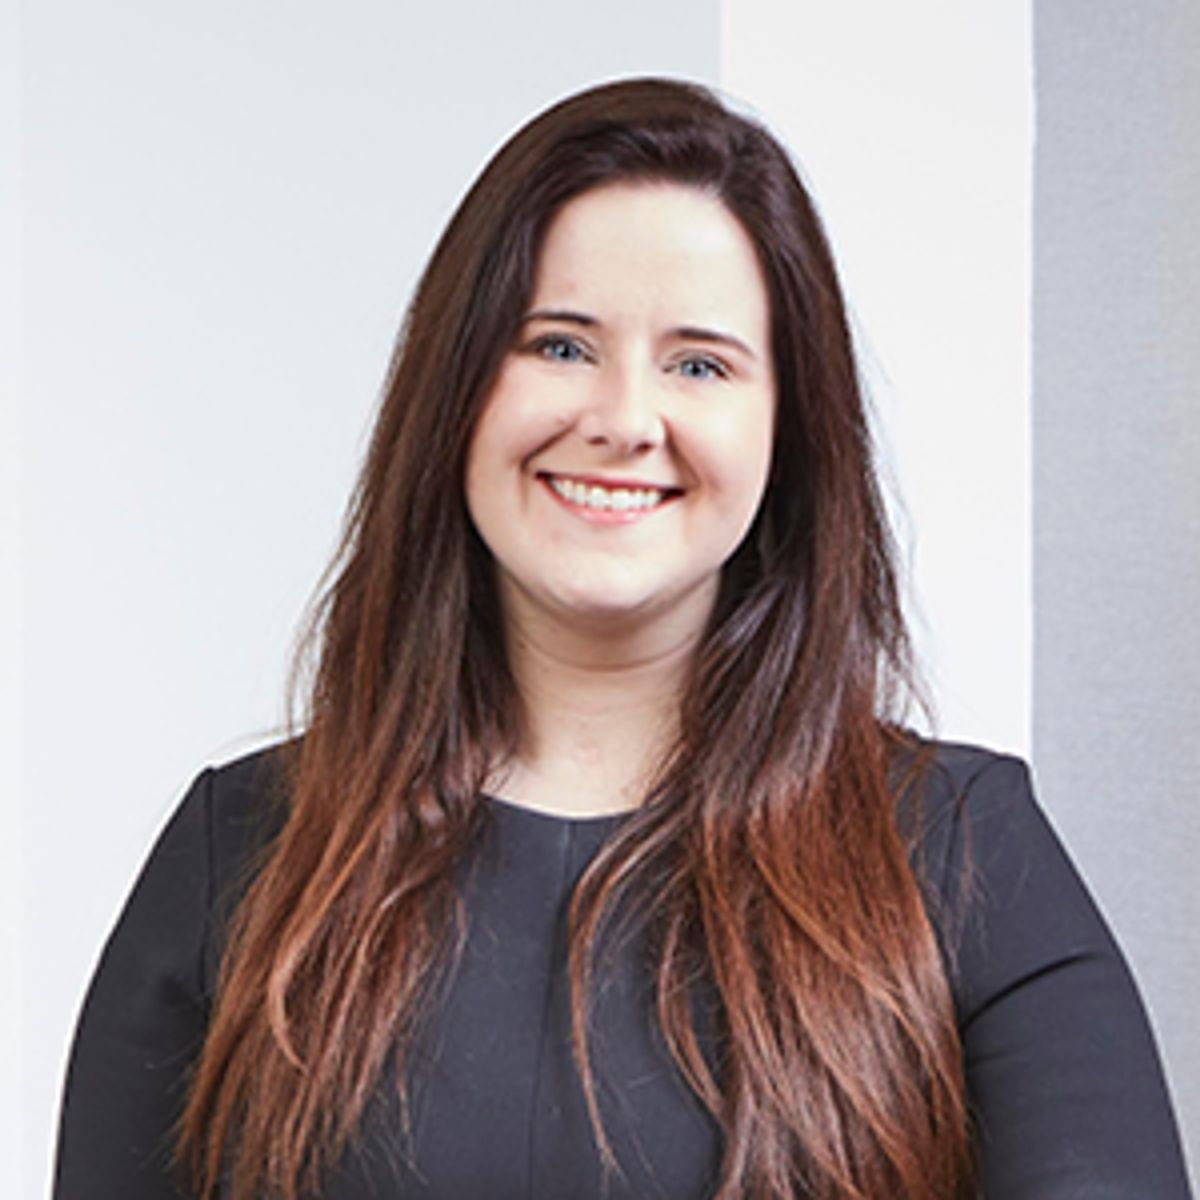 Erica  Nuttall